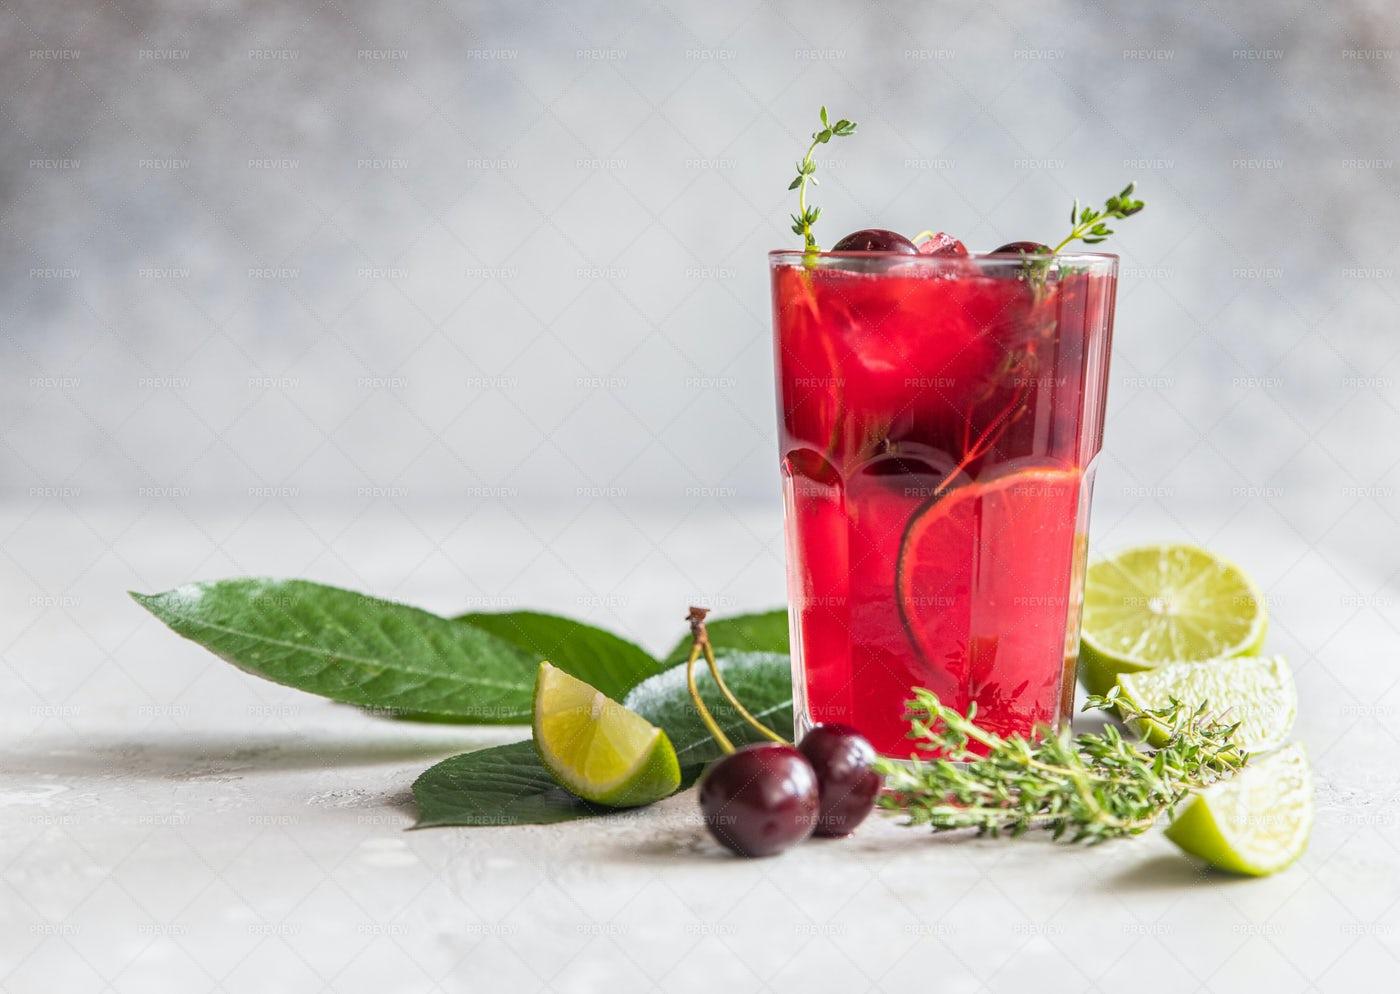 Glass With Cherry Lemonade: Stock Photos